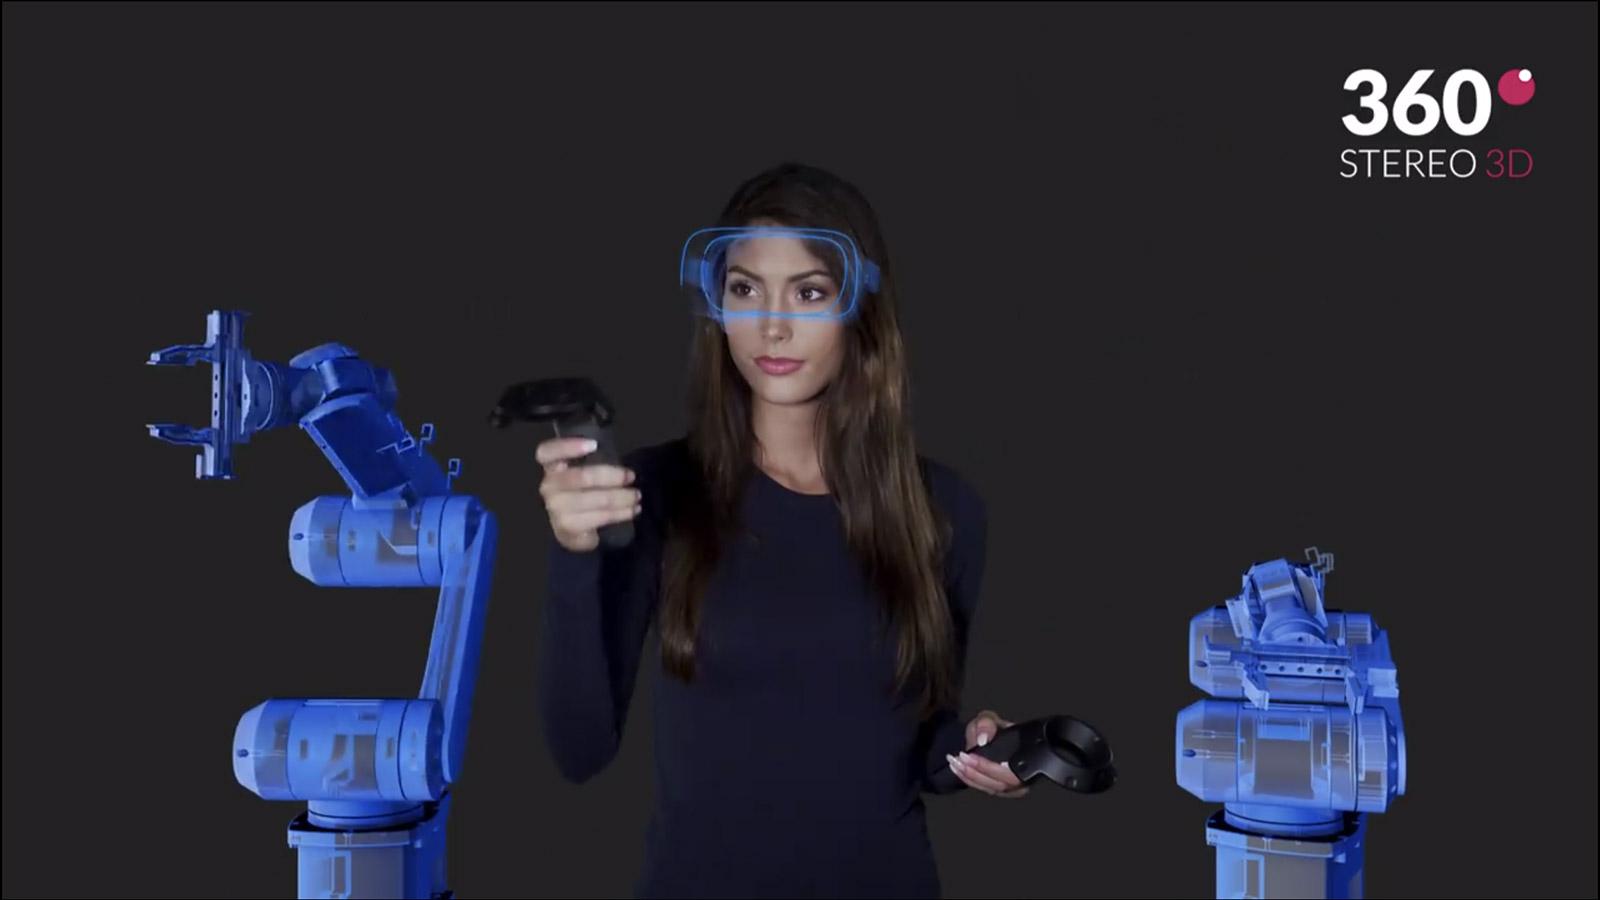 vr-trailer-interaktive-industrie-simulation